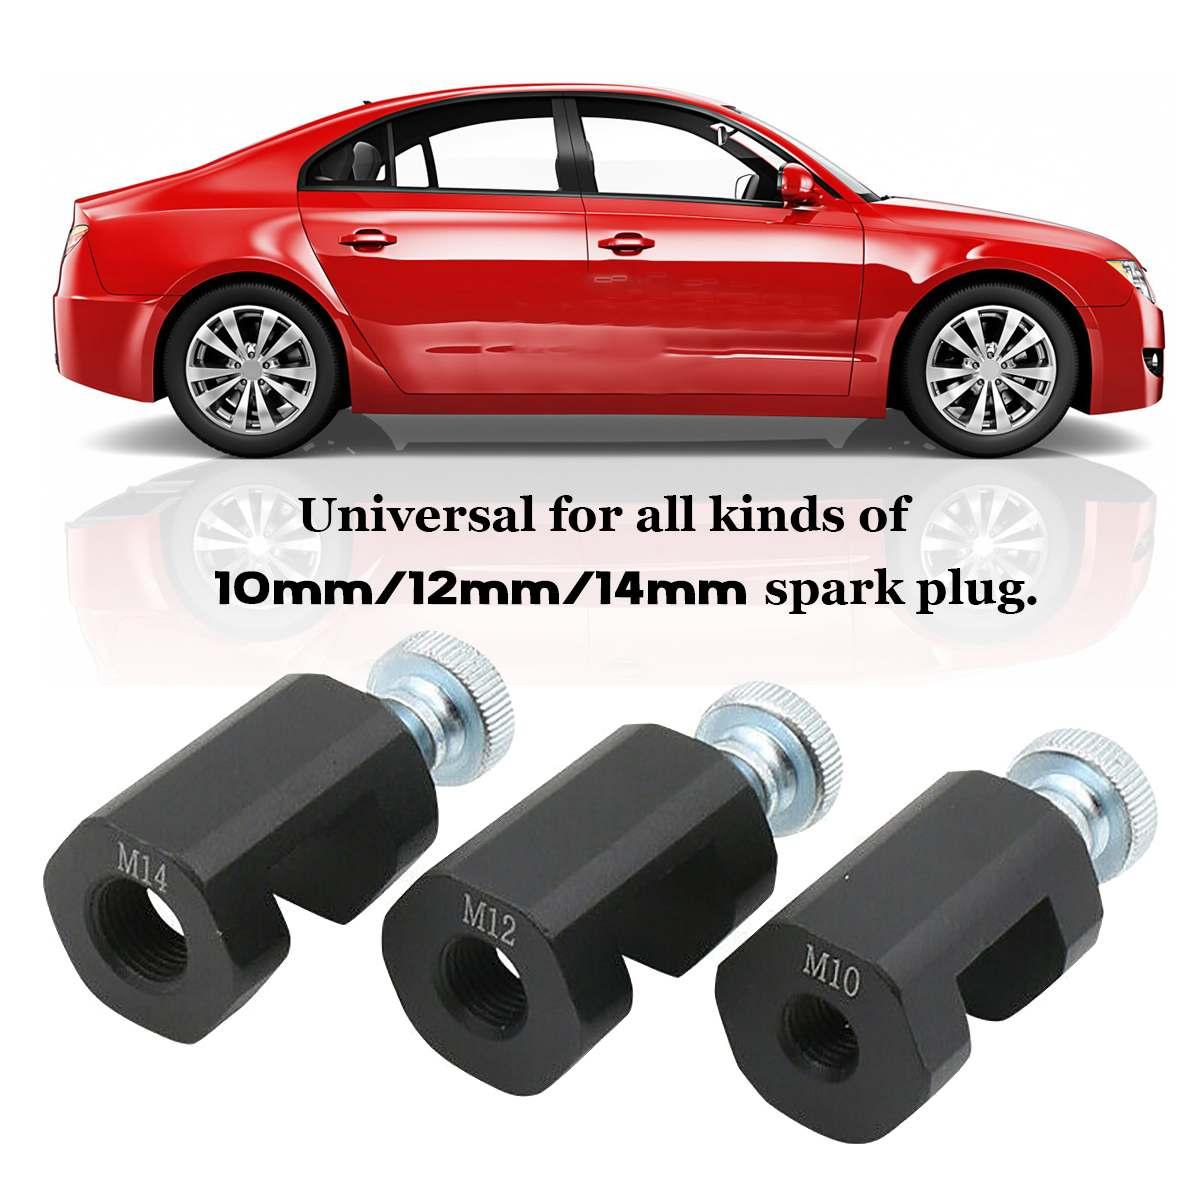 Loyal 10-14mm Auto Spark-plug Gap Gapping Gapper Feeler Aluminum Sparkplug Gauge Caliper Engine Ignition System Diagnostic Test Tool Always Buy Good